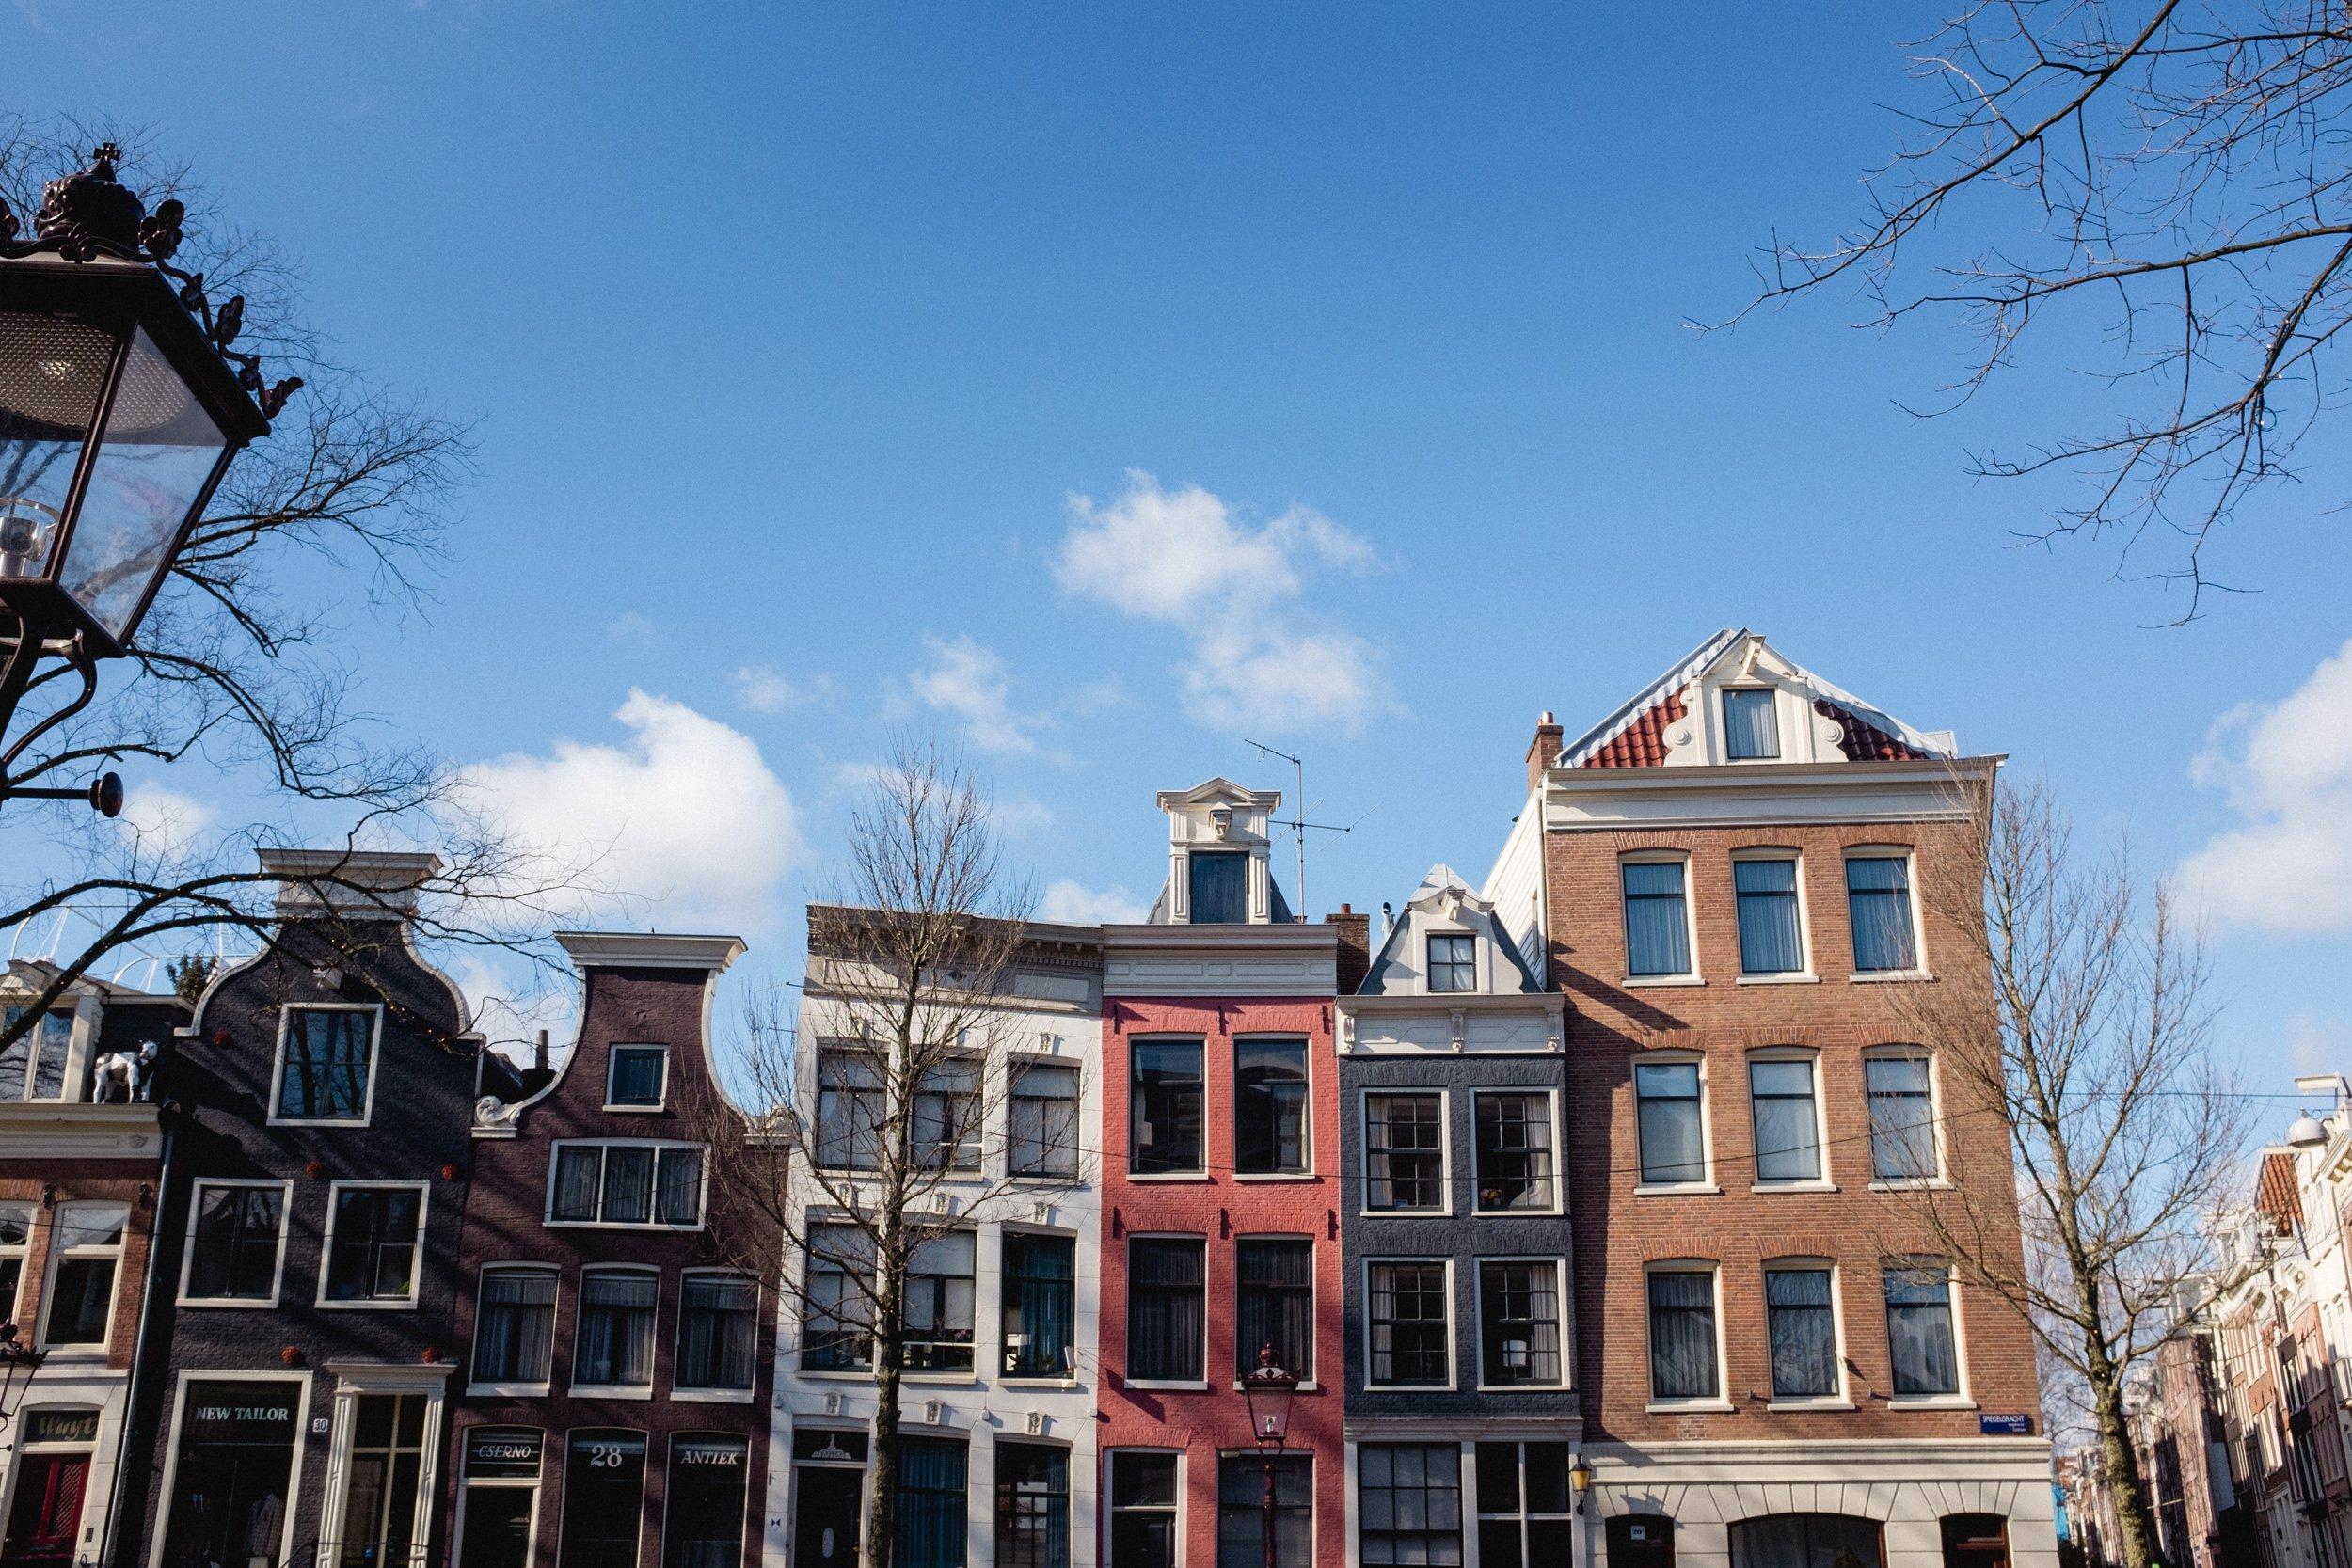 Amsterdam_Travel_Photography_0011.jpg